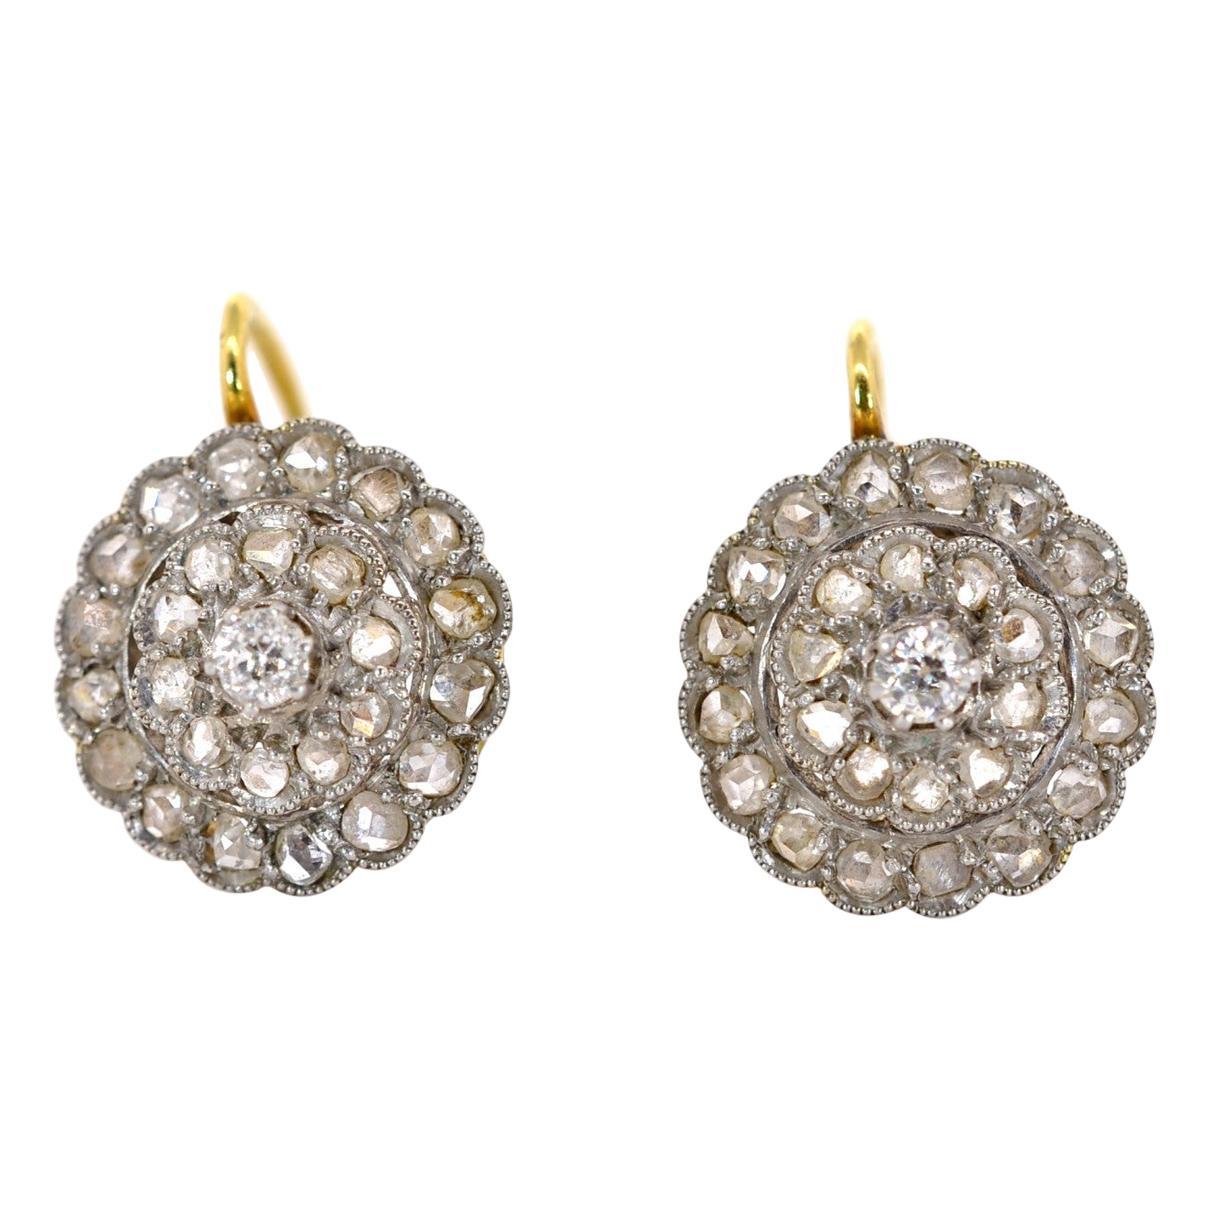 Antique Rose Cut Diamonds Cluster Earrings